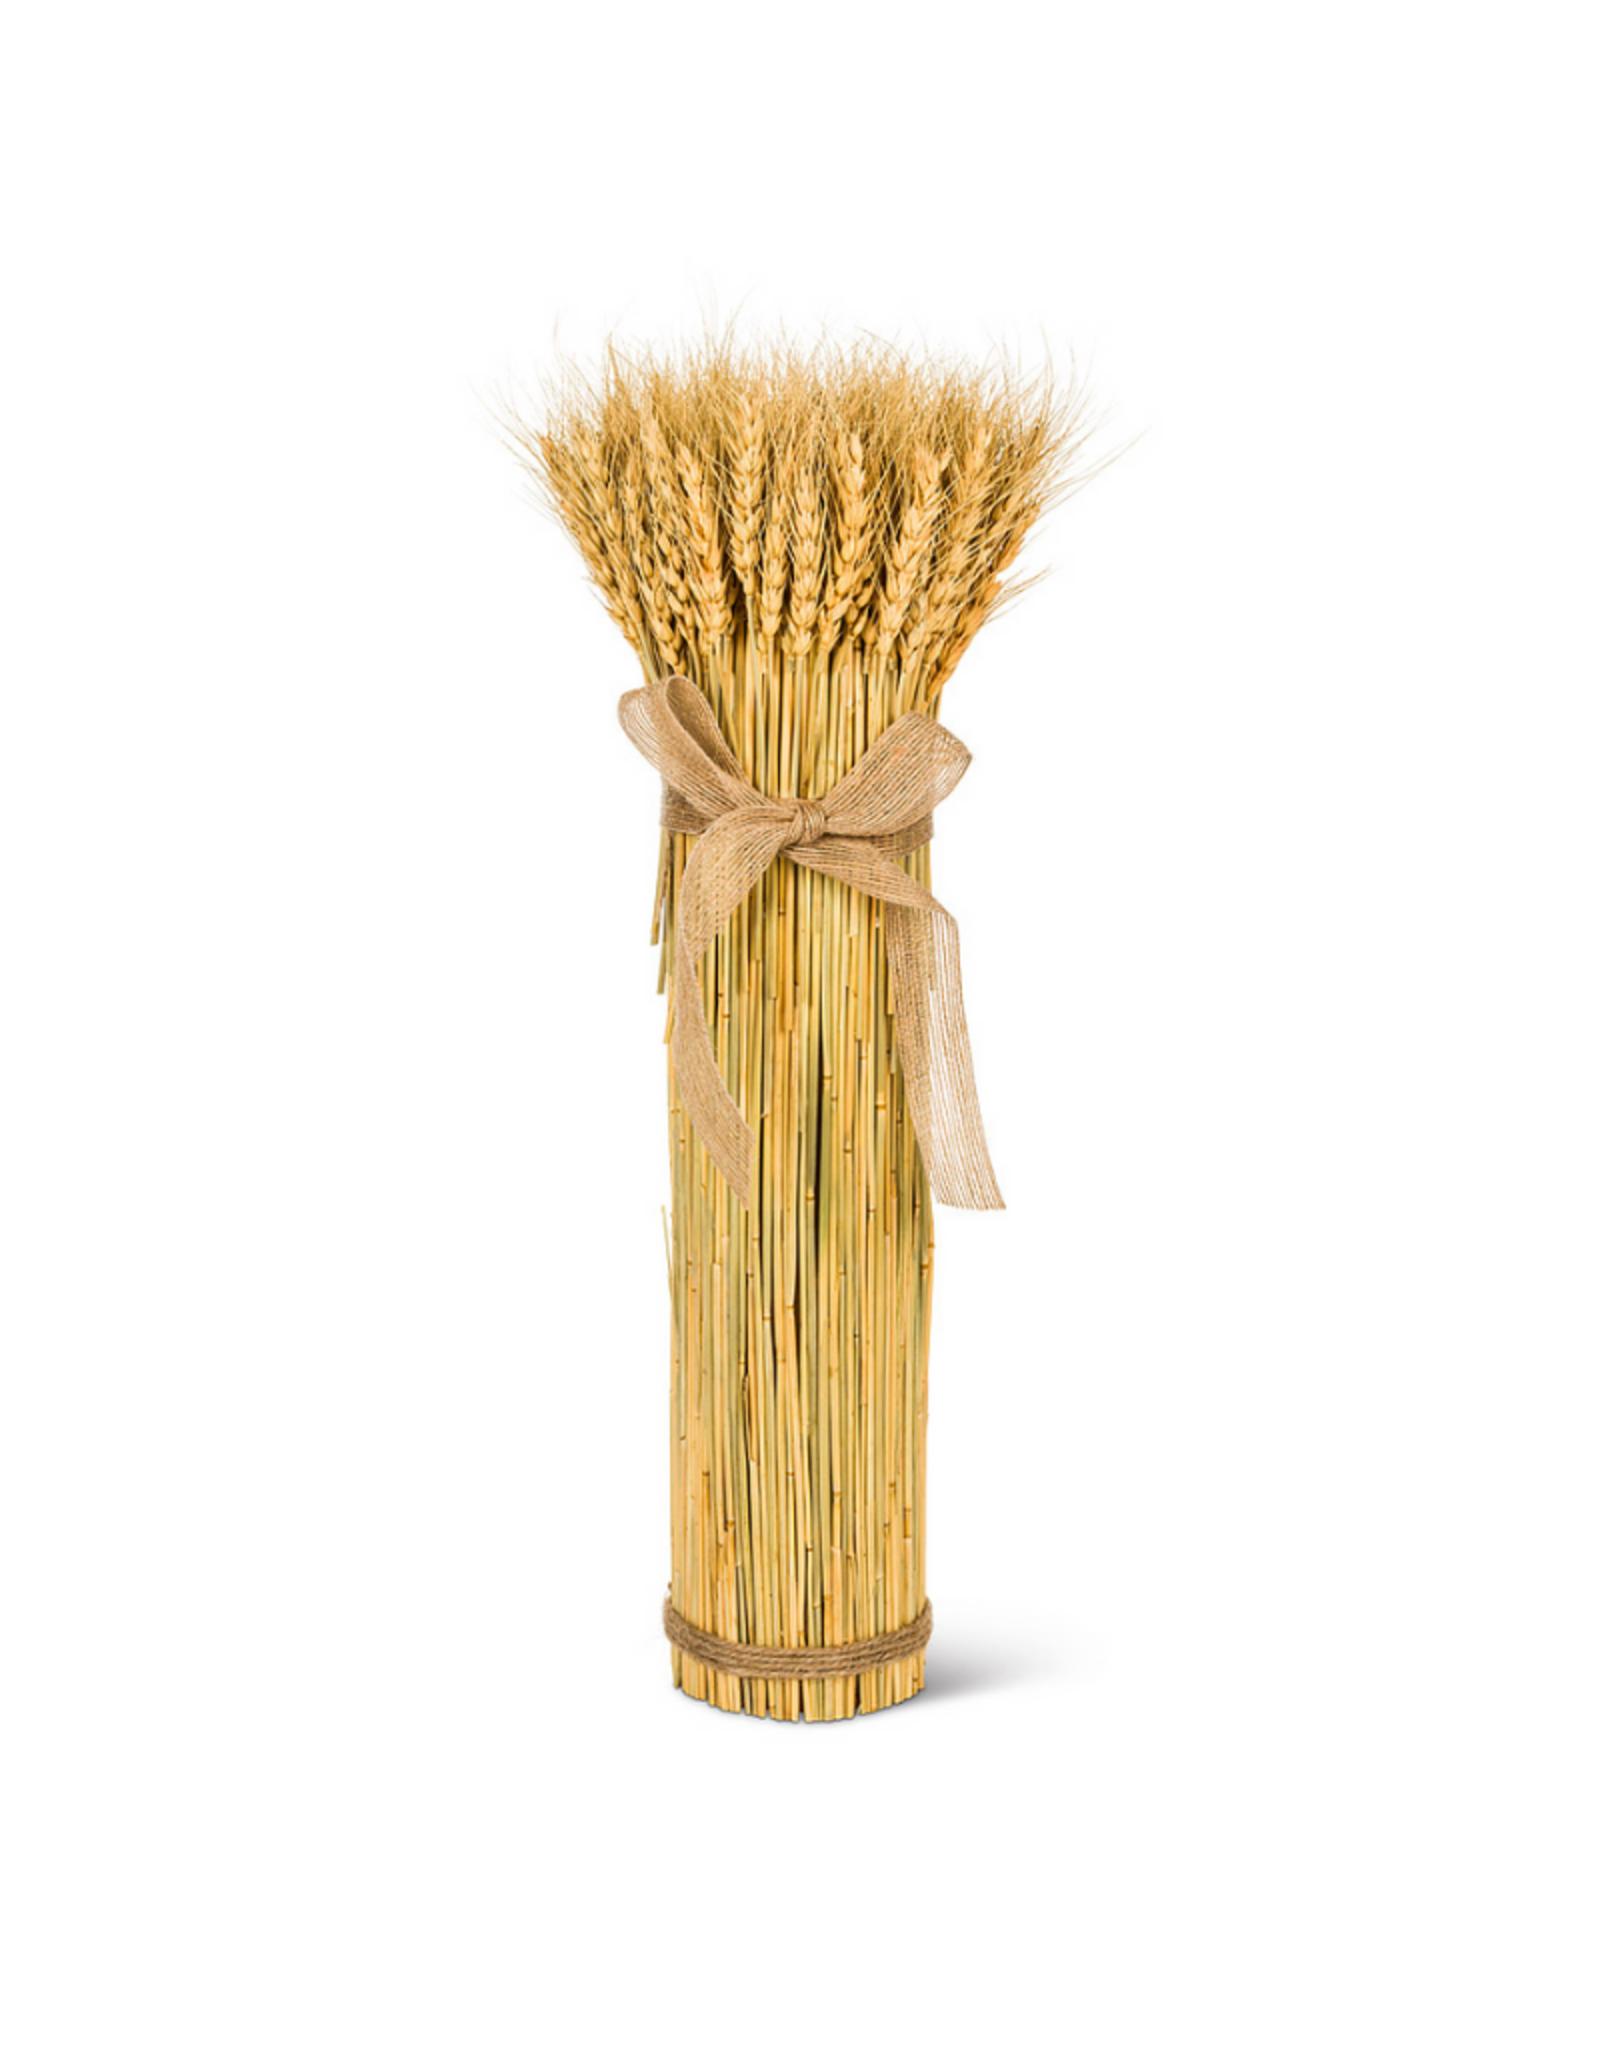 Abbott Gerbe de blé 19'' hauteur